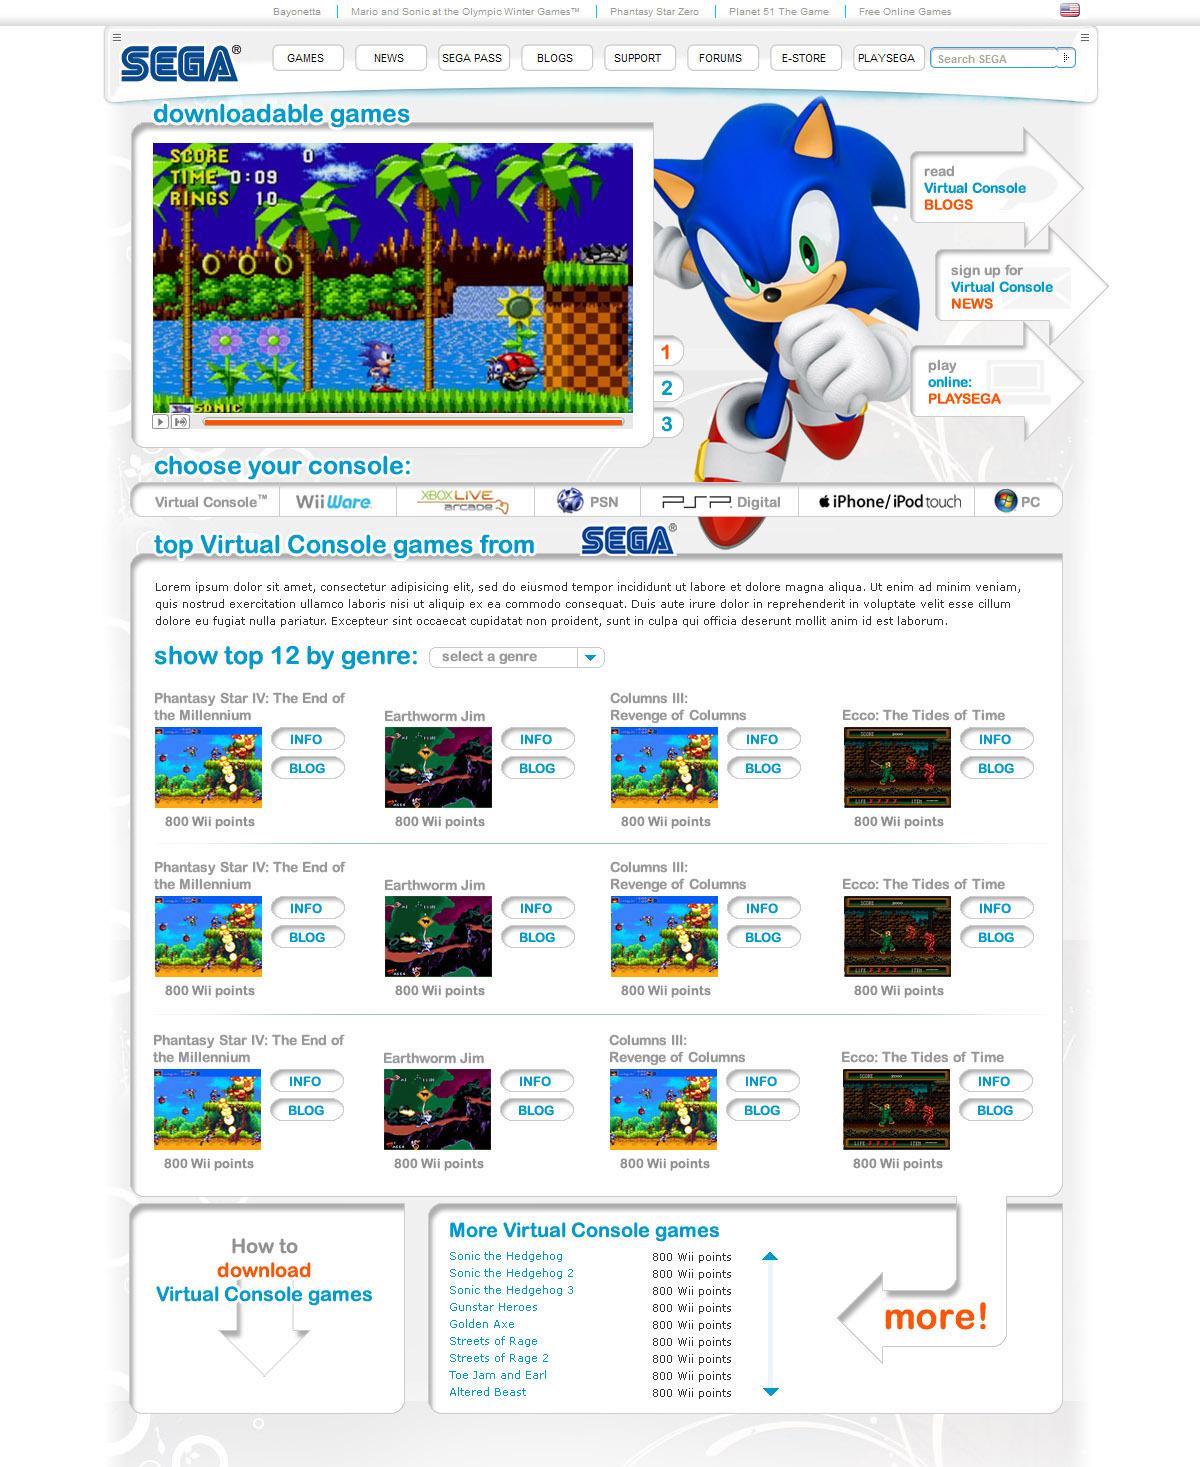 SEGA_Digitized_Games_Hub_homee_4.jpg